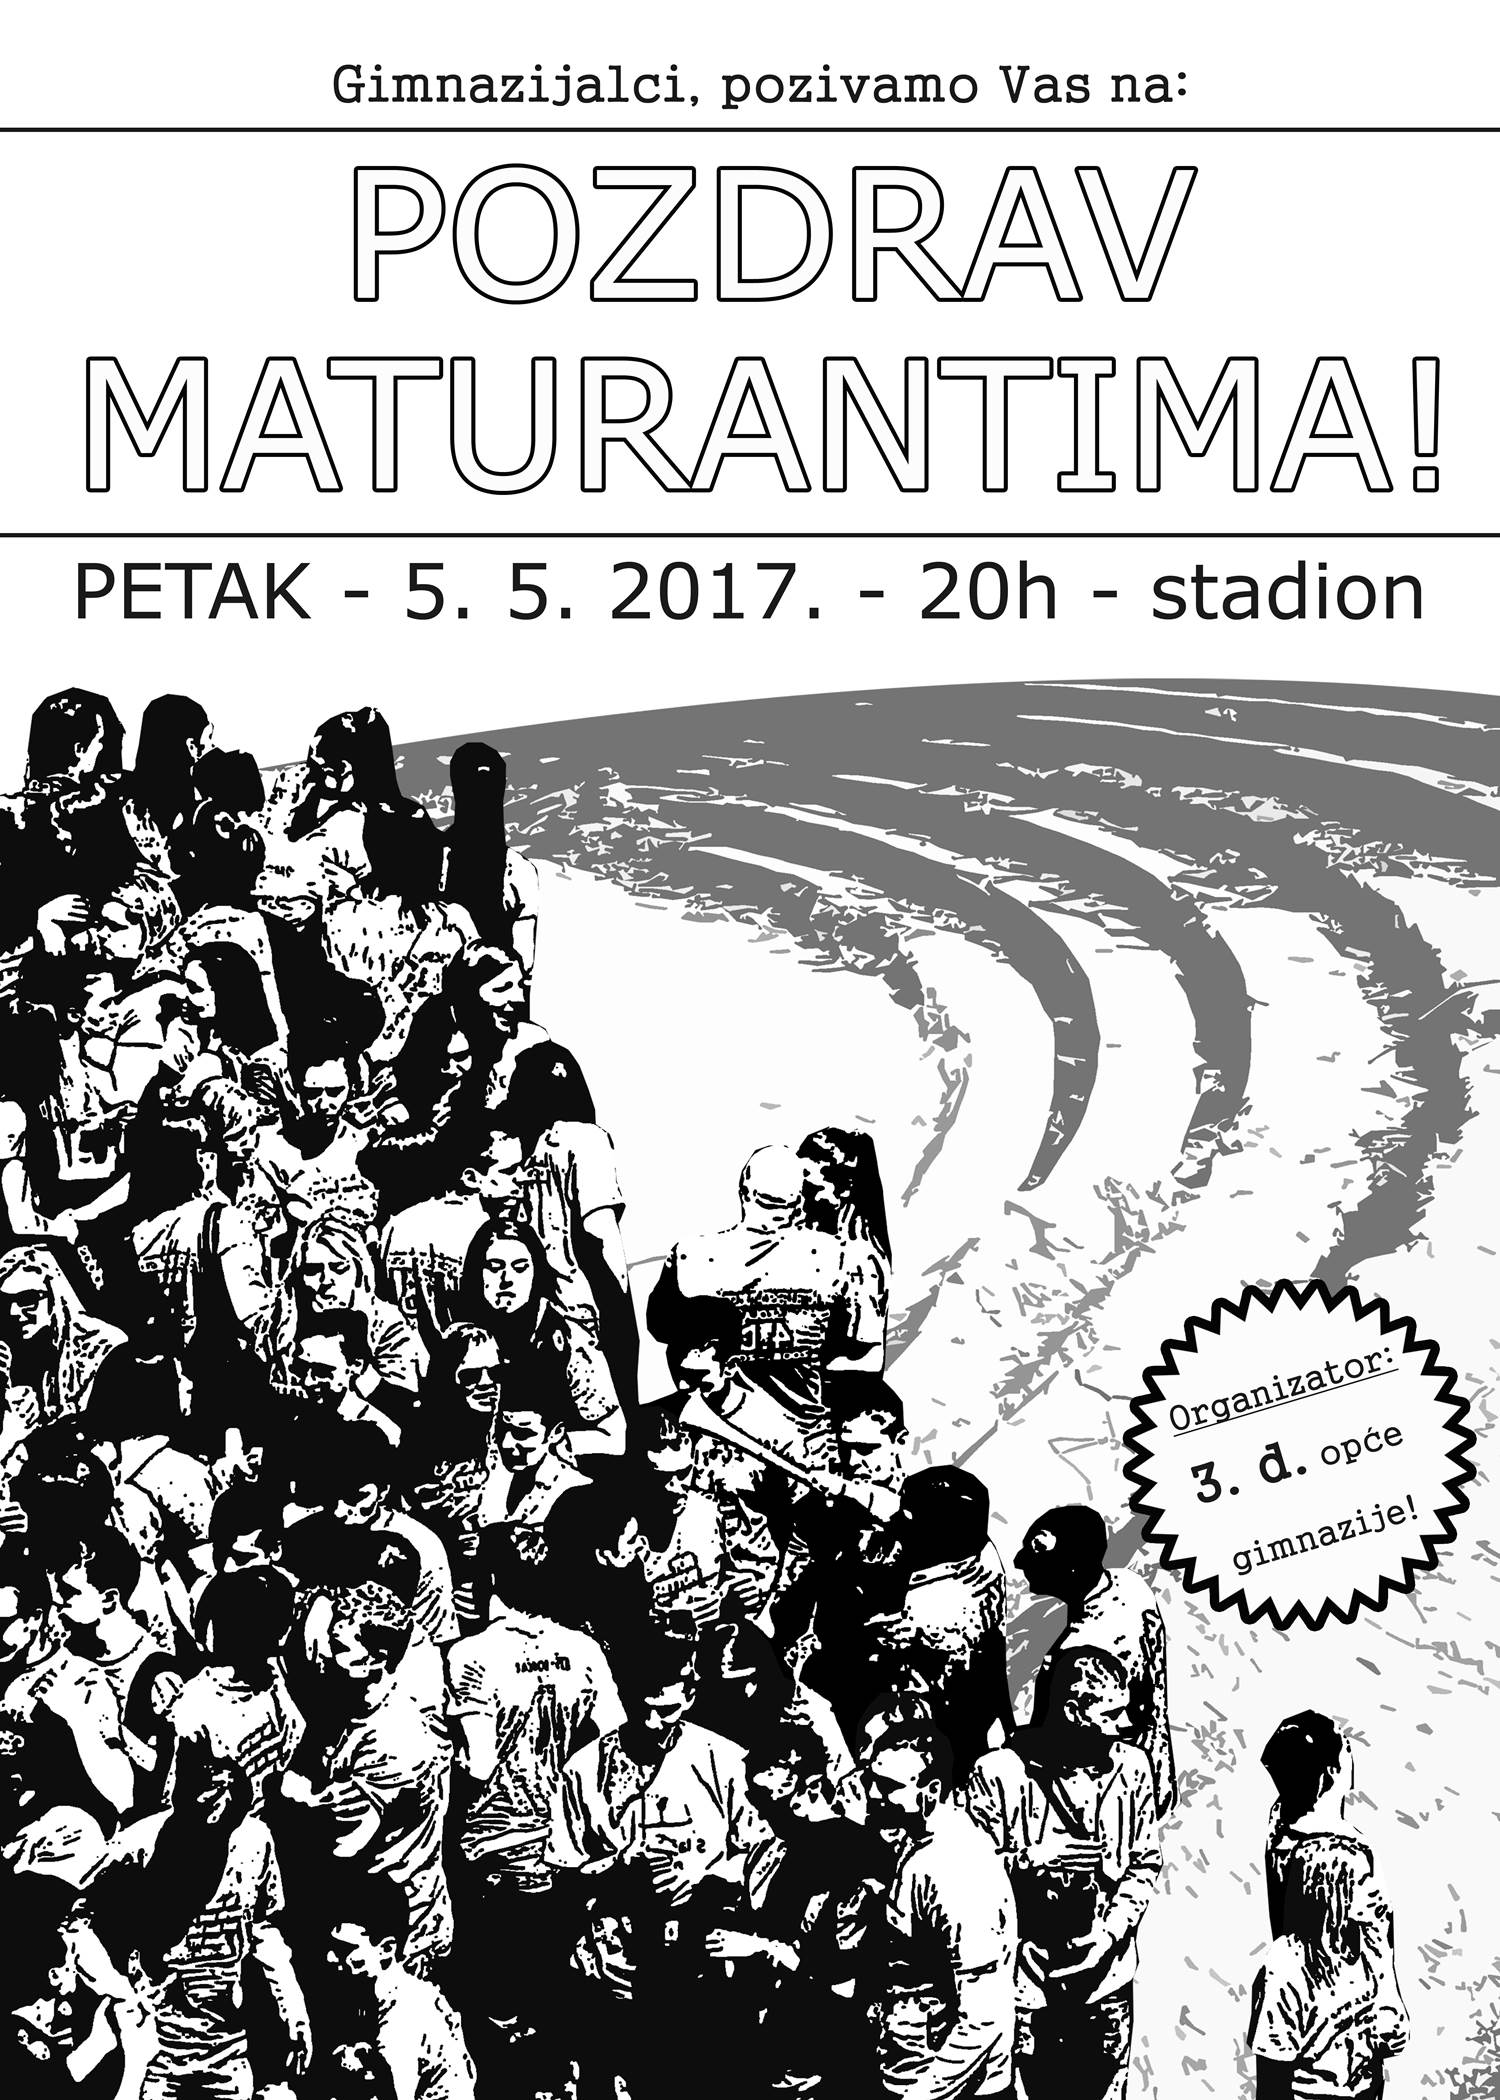 PLAKAT - POZDRAV MATURANTIMA 2017 50x70